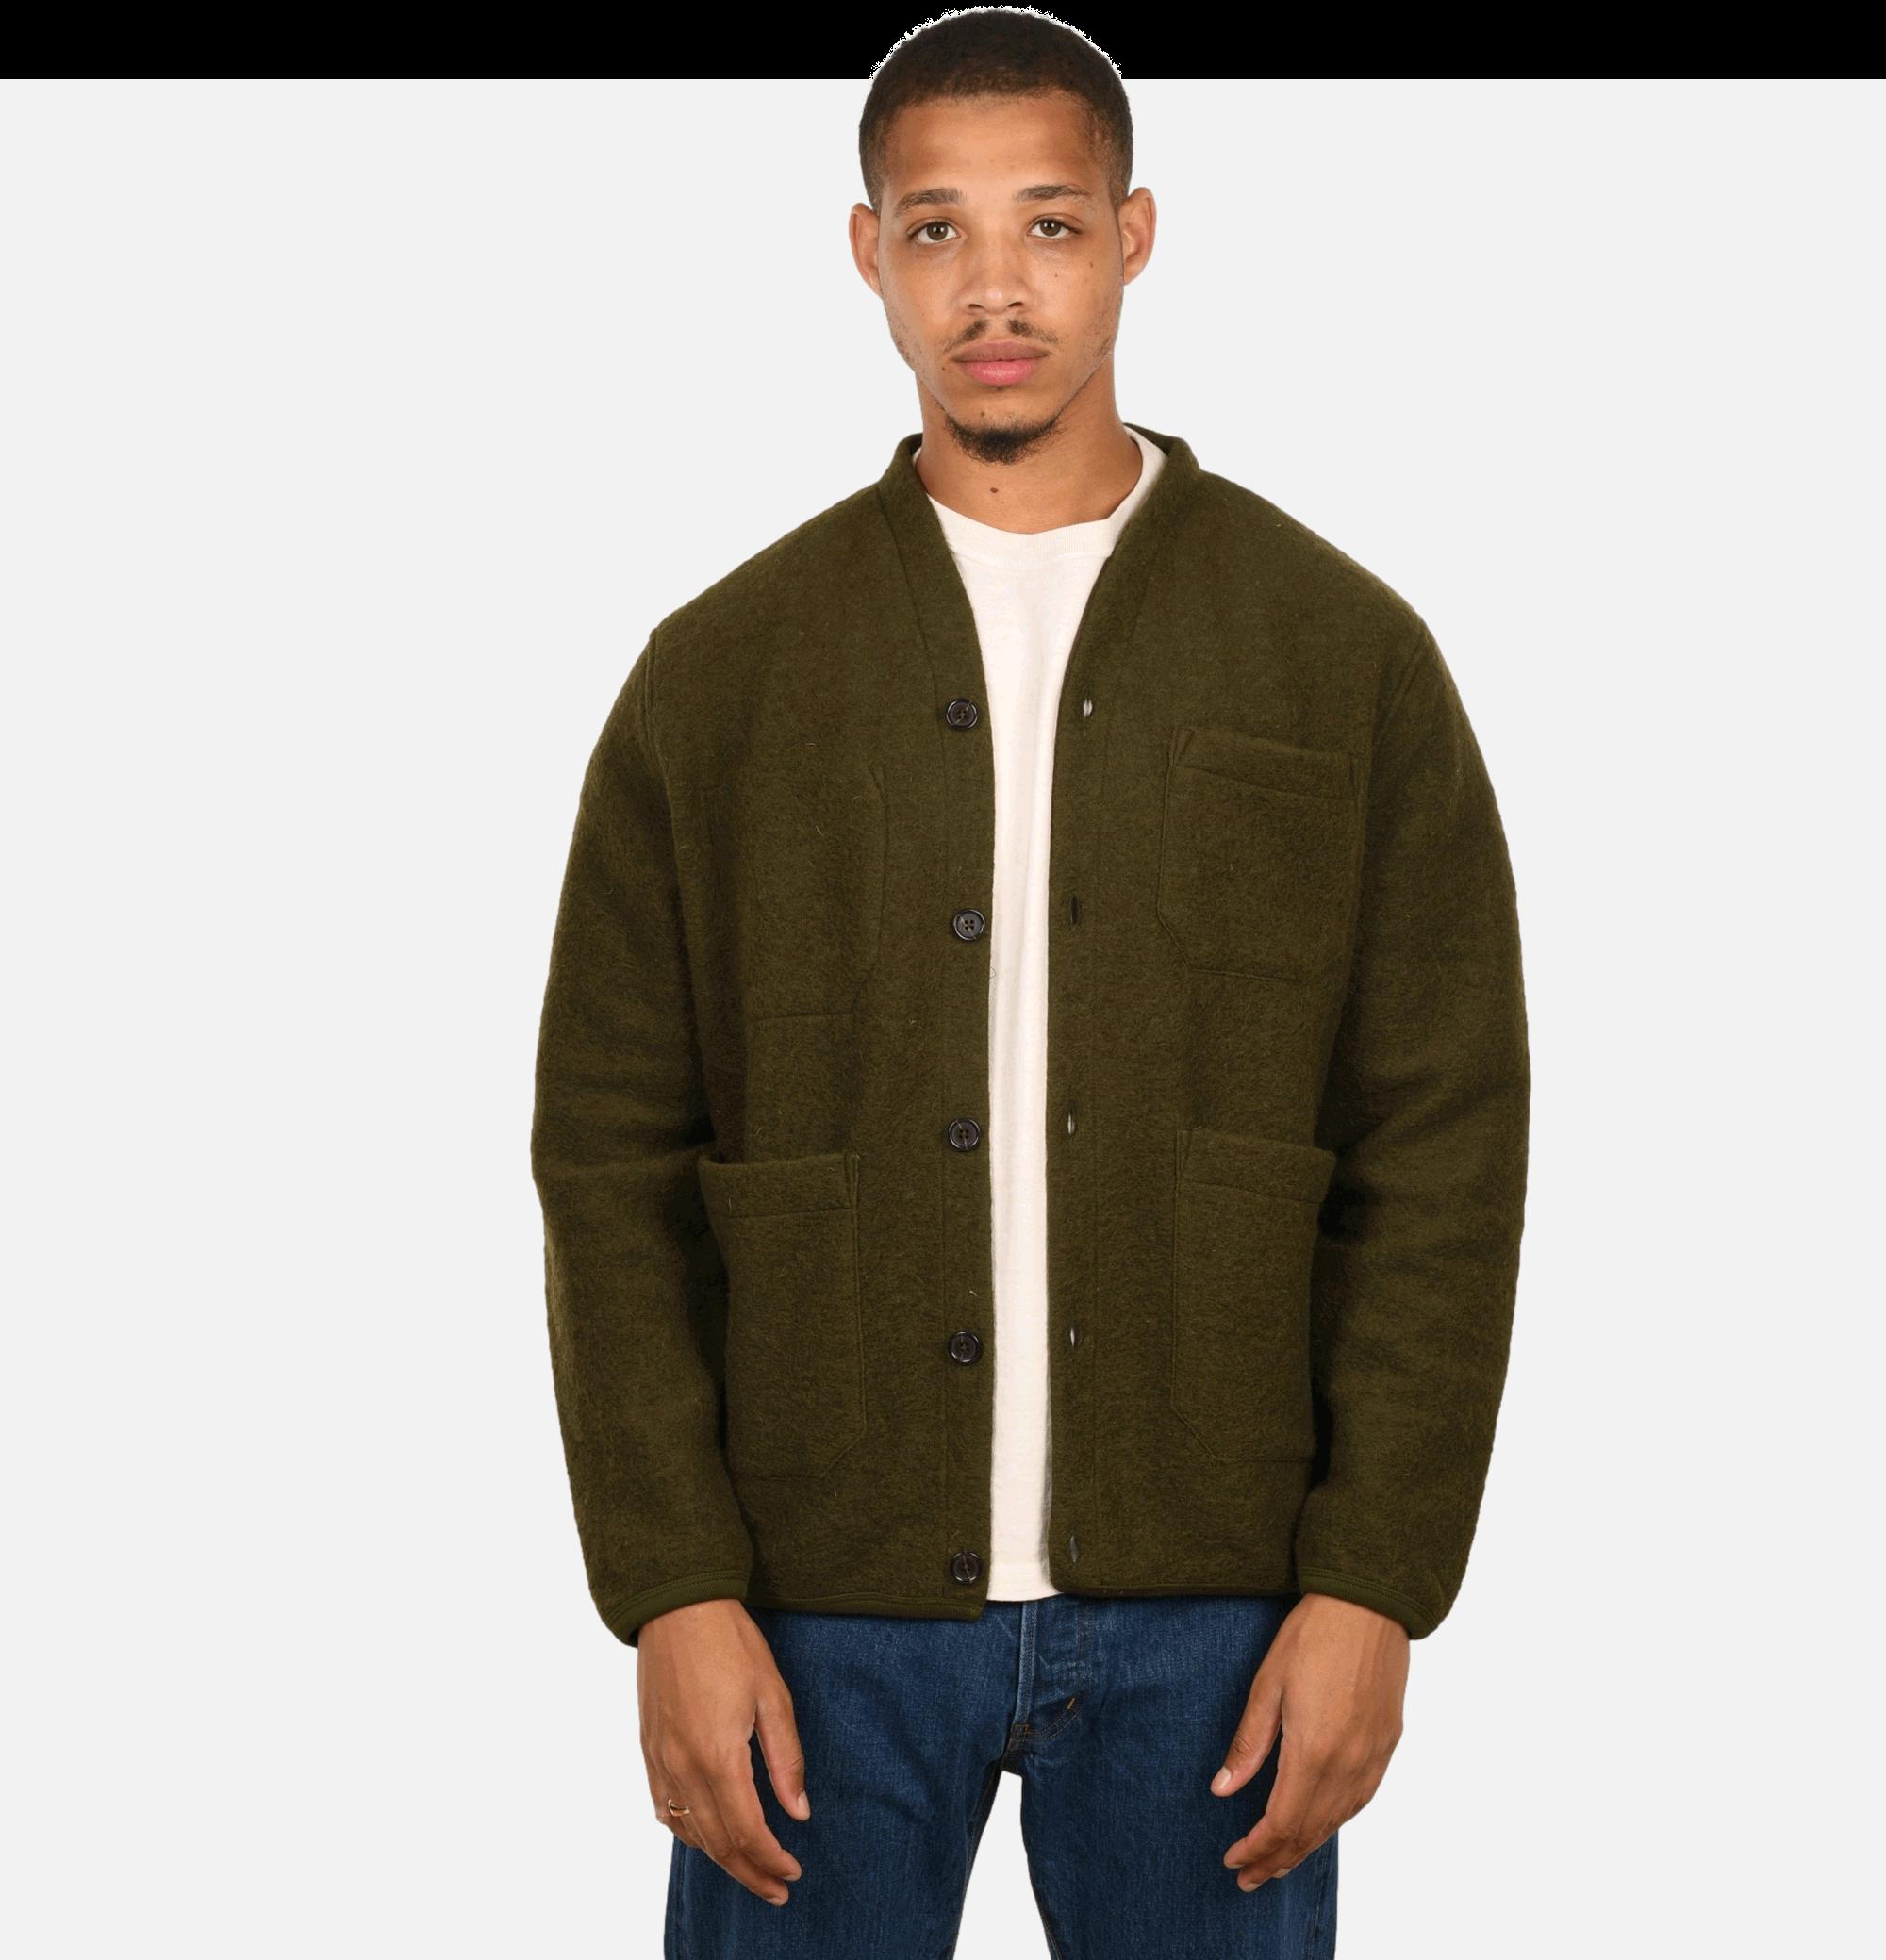 Cardigan Wool Fleece Olive